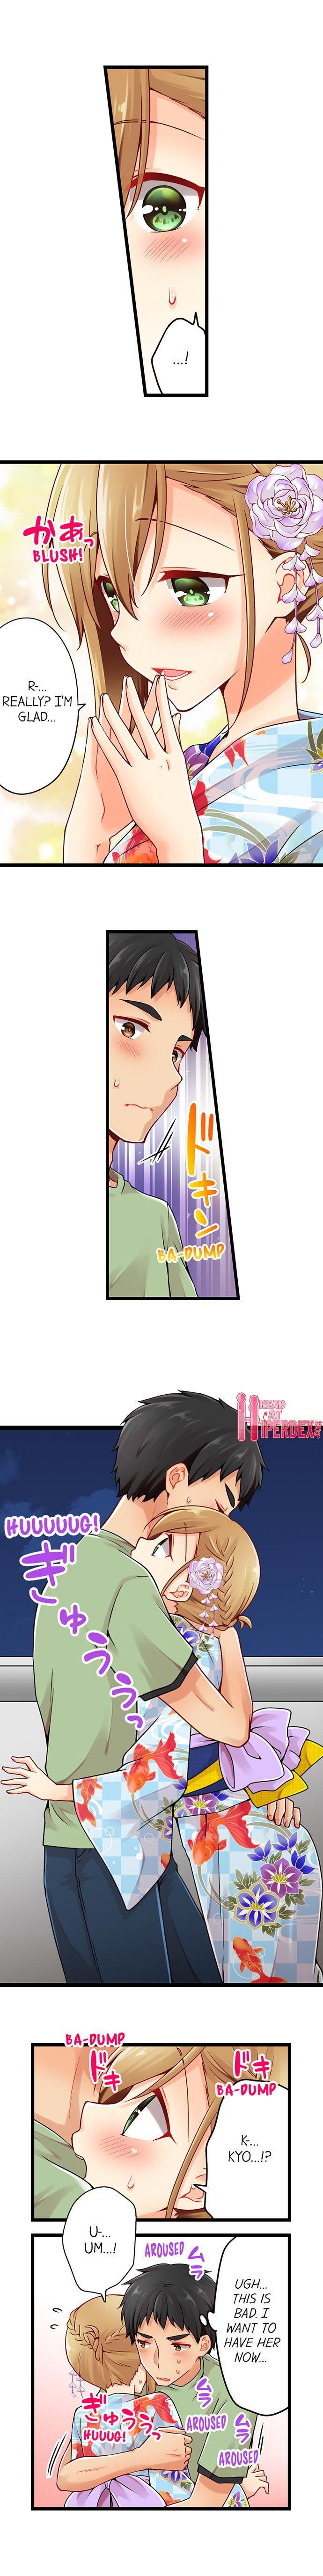 Ren Arisugawa Is Actually A Girl 781